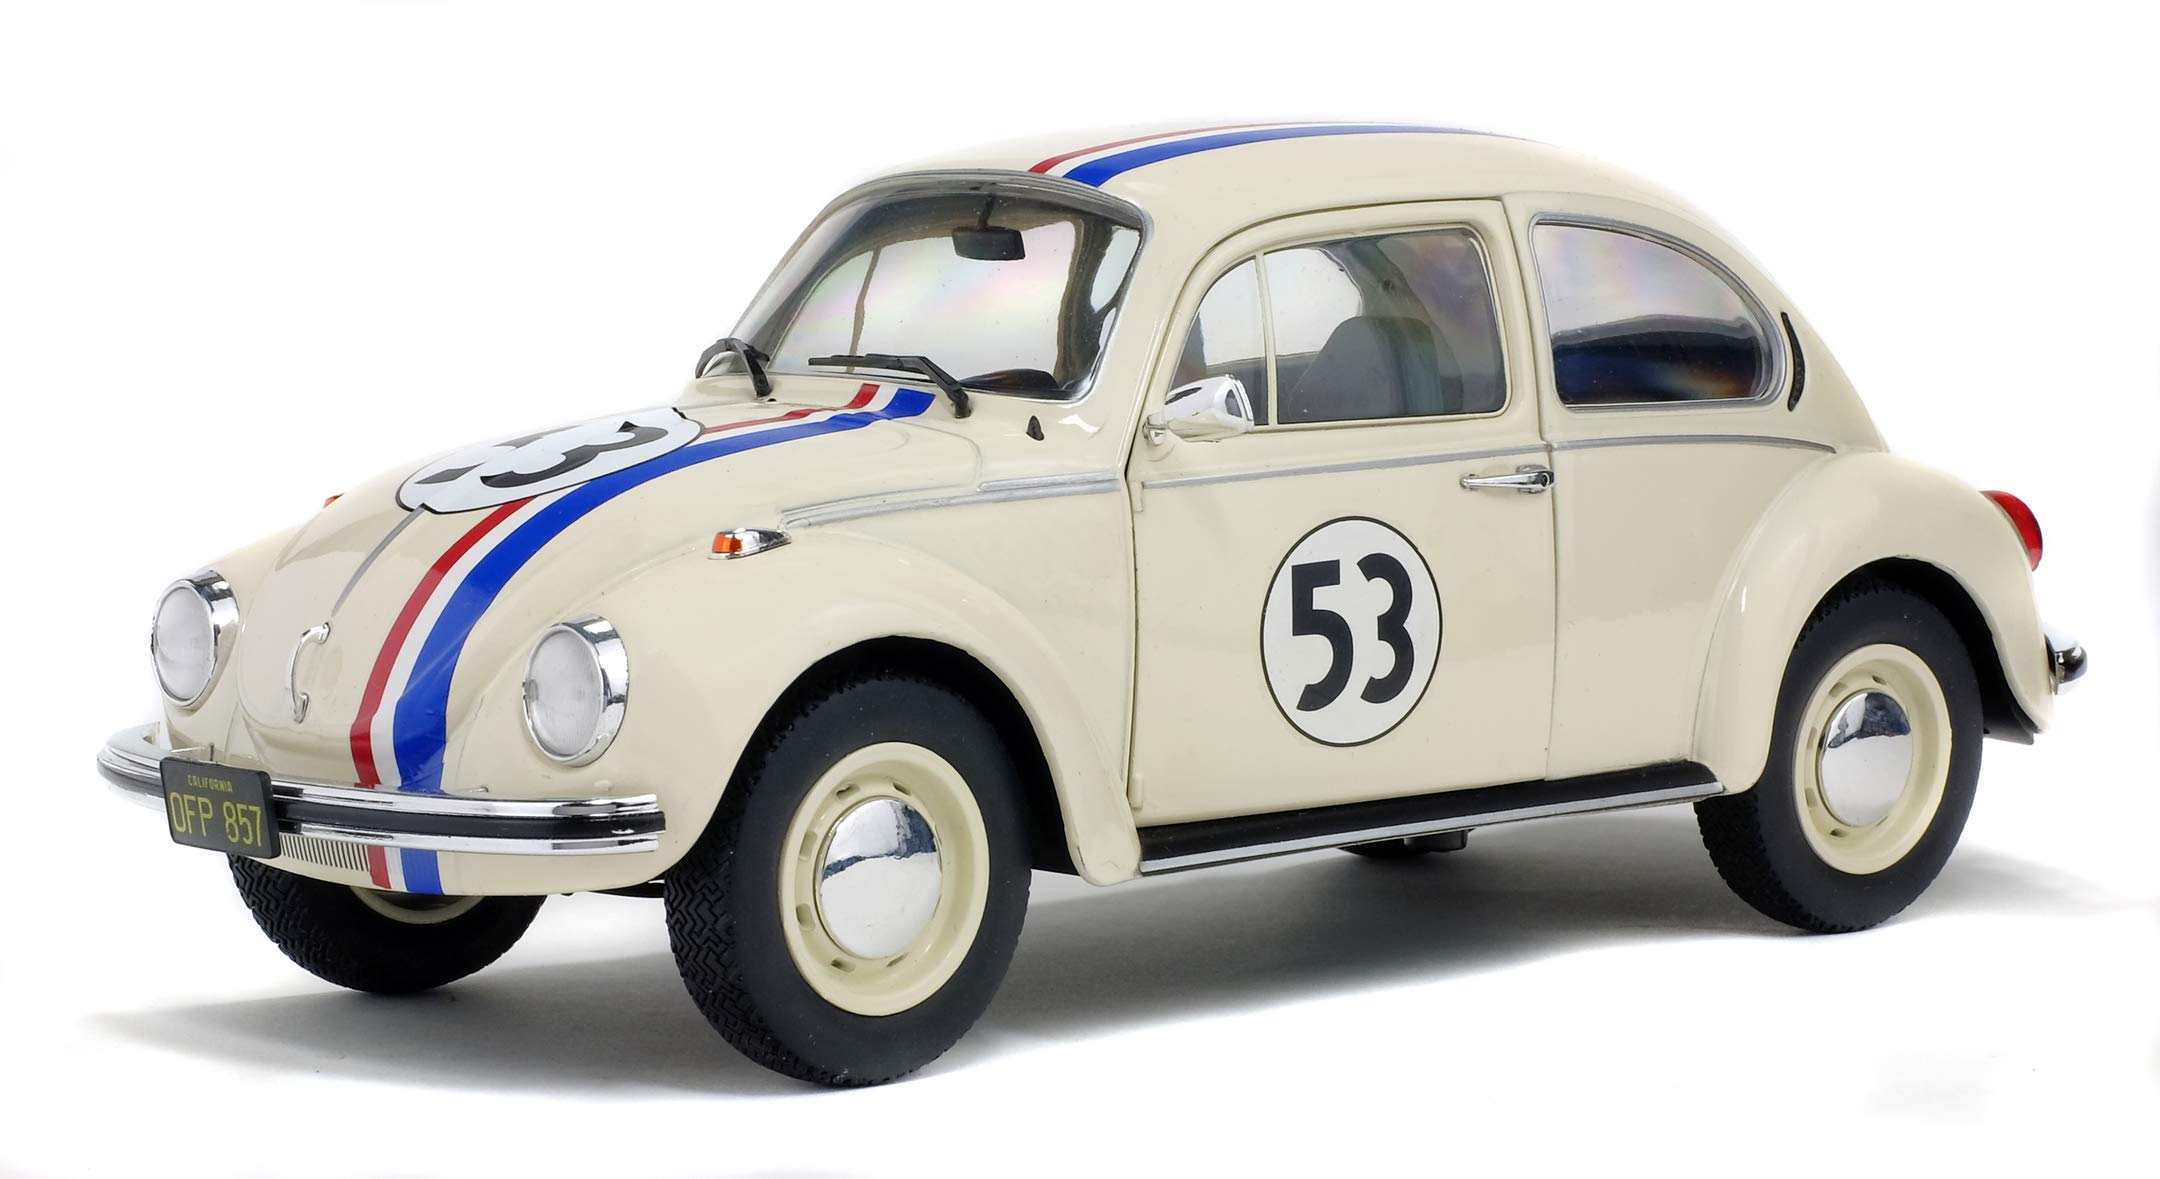 "Solido 421184040 1:18 VW Käfer 1973 Volkswagen Beetle 1303 Racer 53"" Die-Cast Model, Beige, Scale"